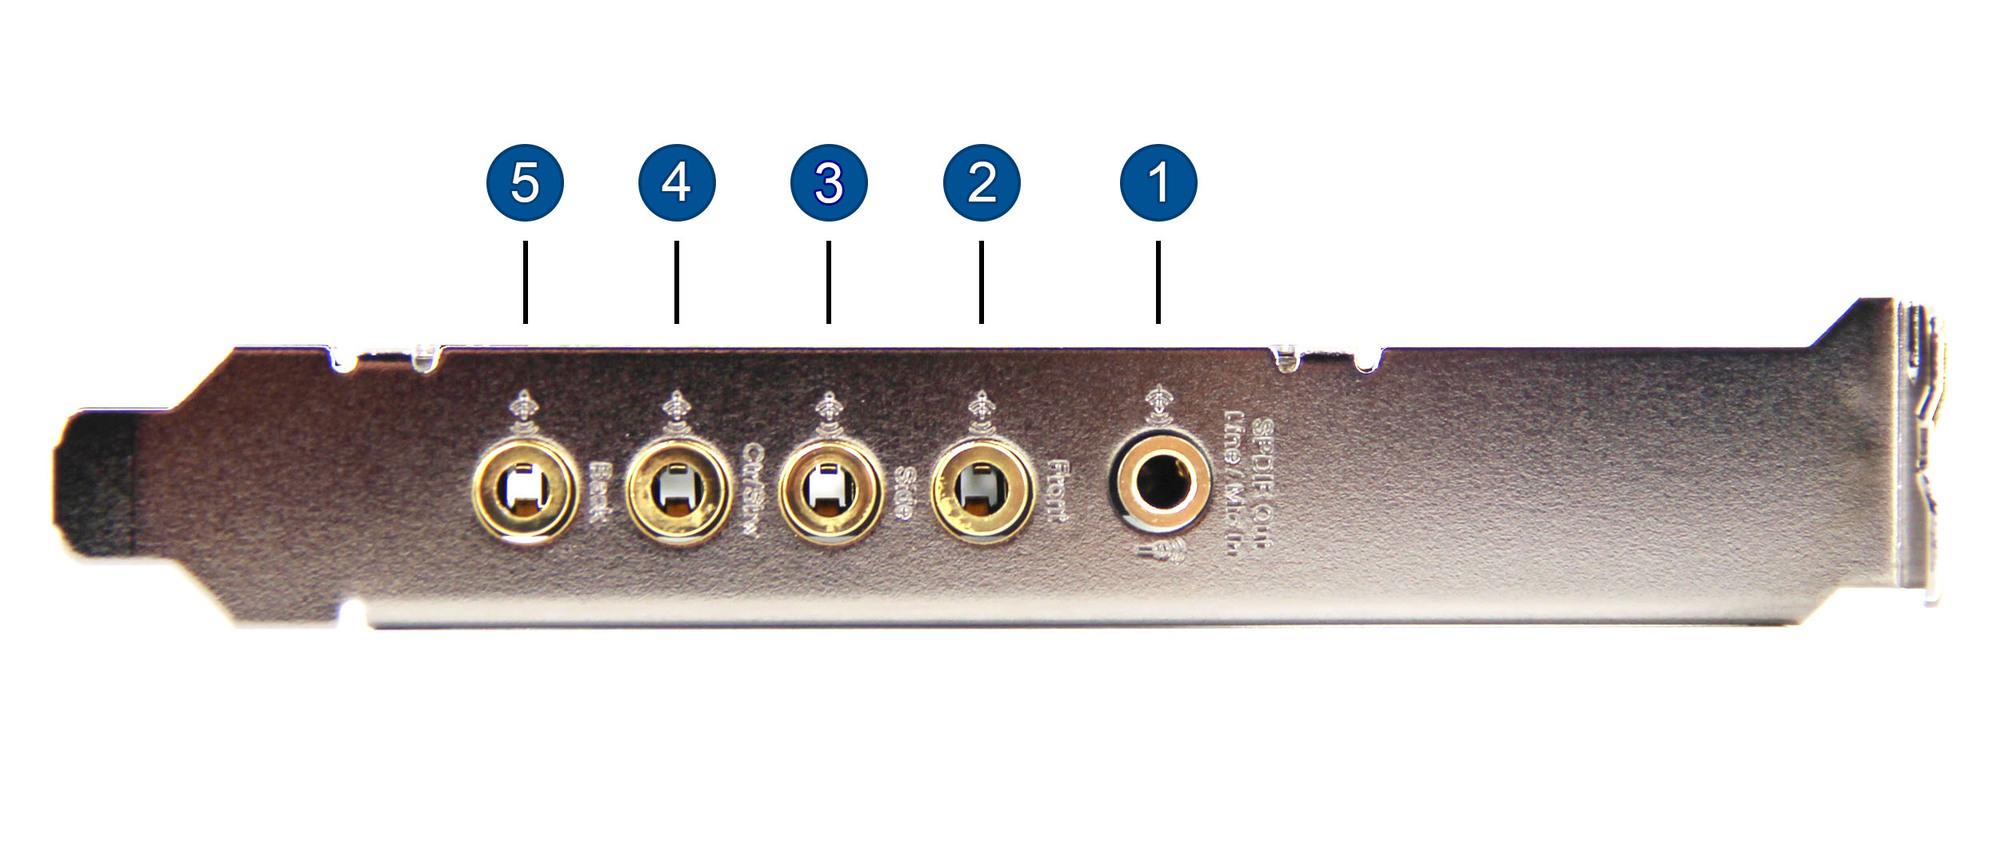 Asus xonar dg pci 5. 1 sound card & headphone amplifier | adult.